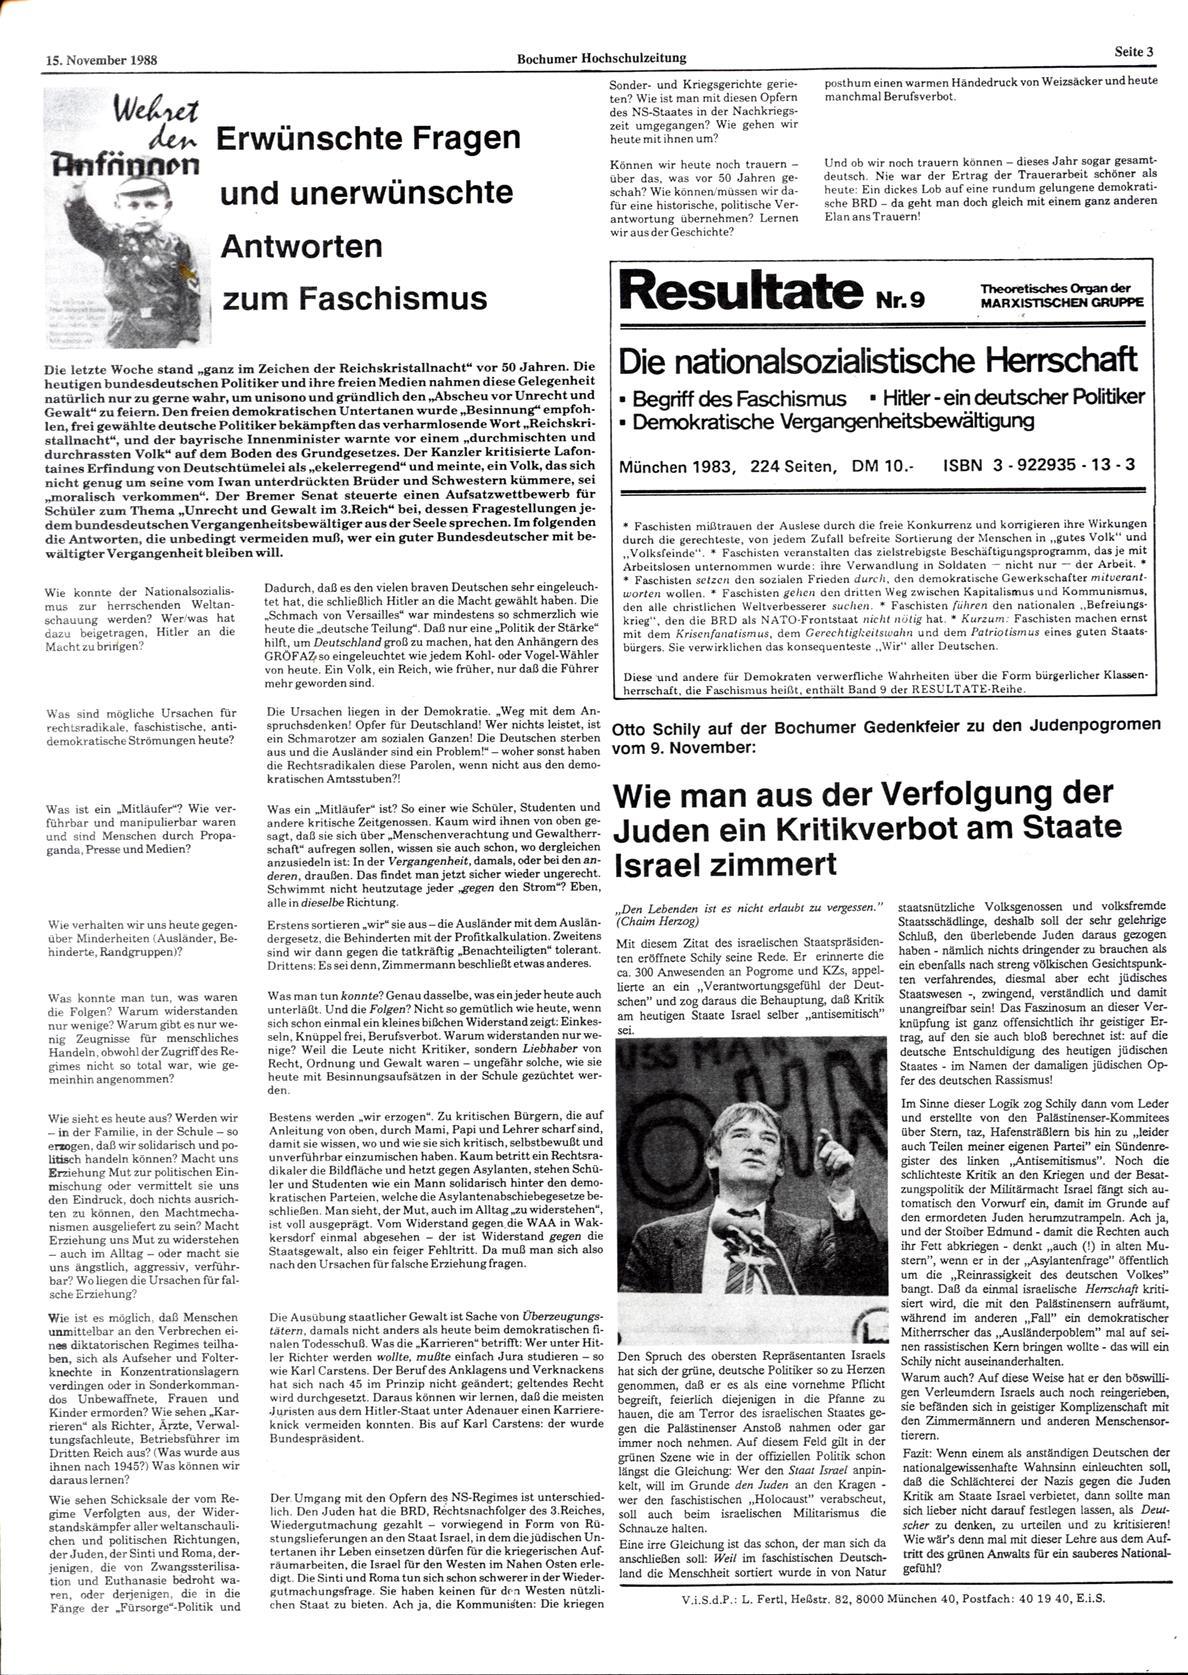 Bochum_BHZ_19881115_181_003